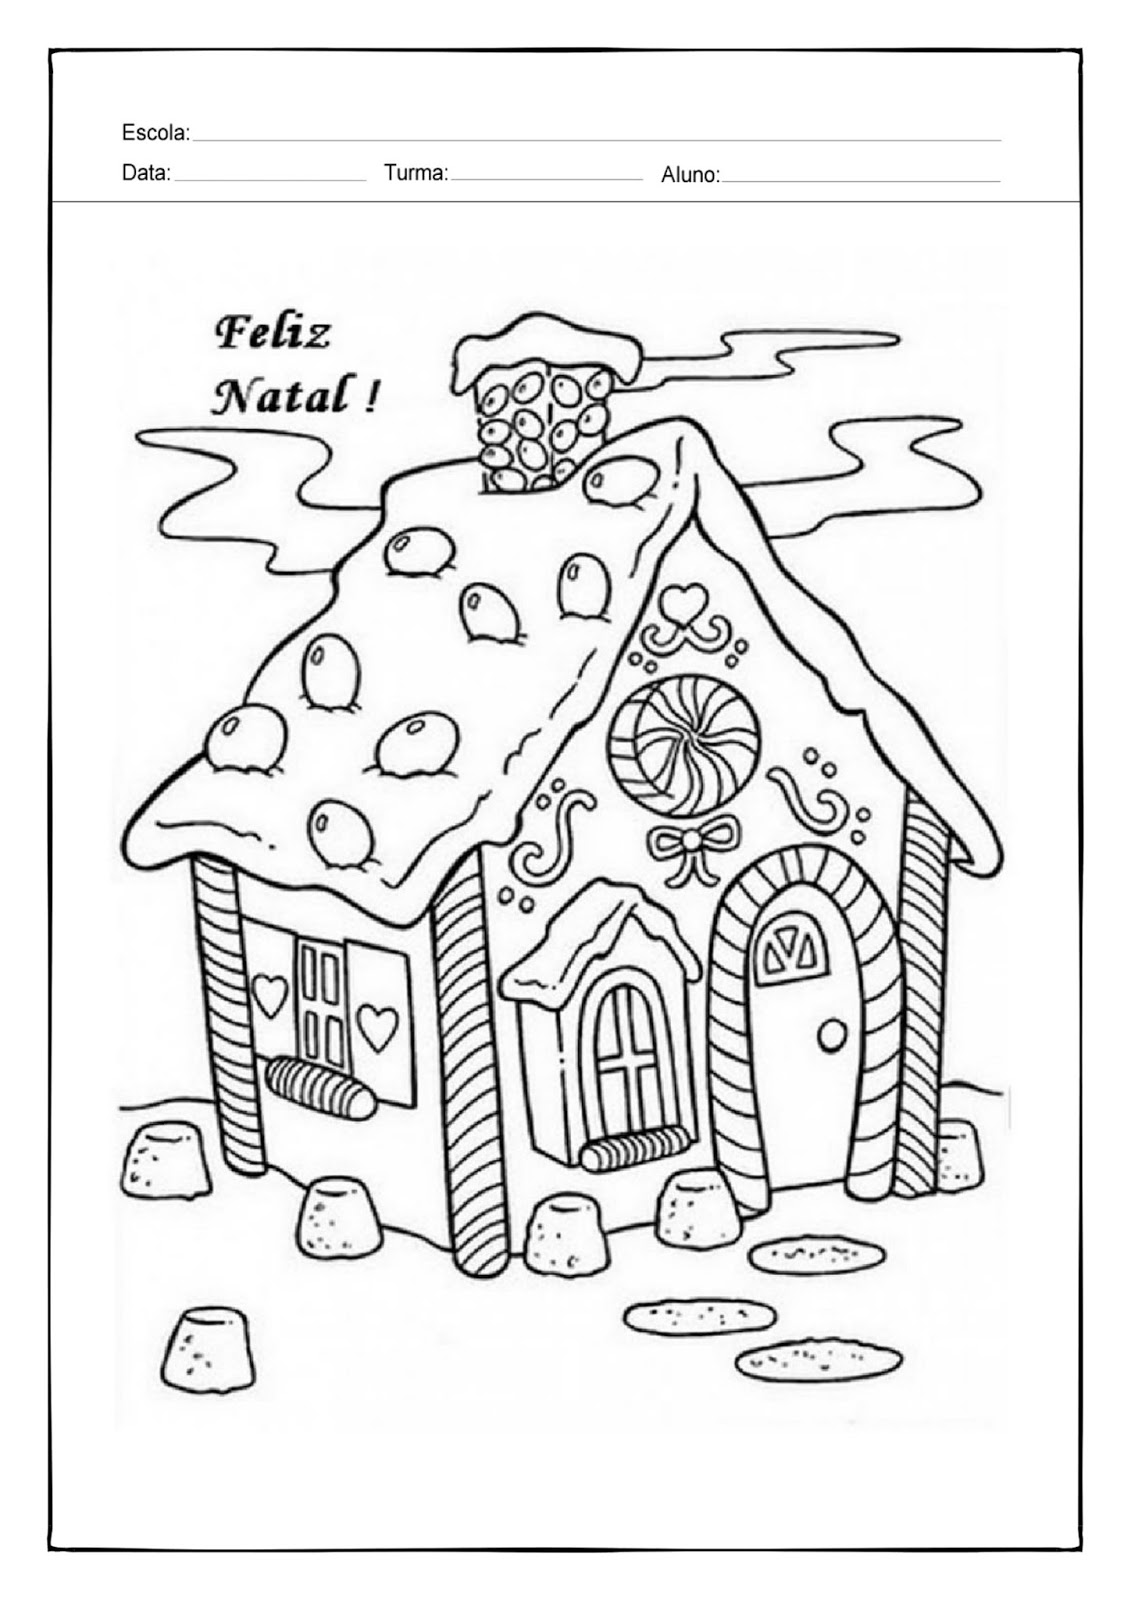 Modelos De Atividades Escolares Atividade Para Colorir Natal